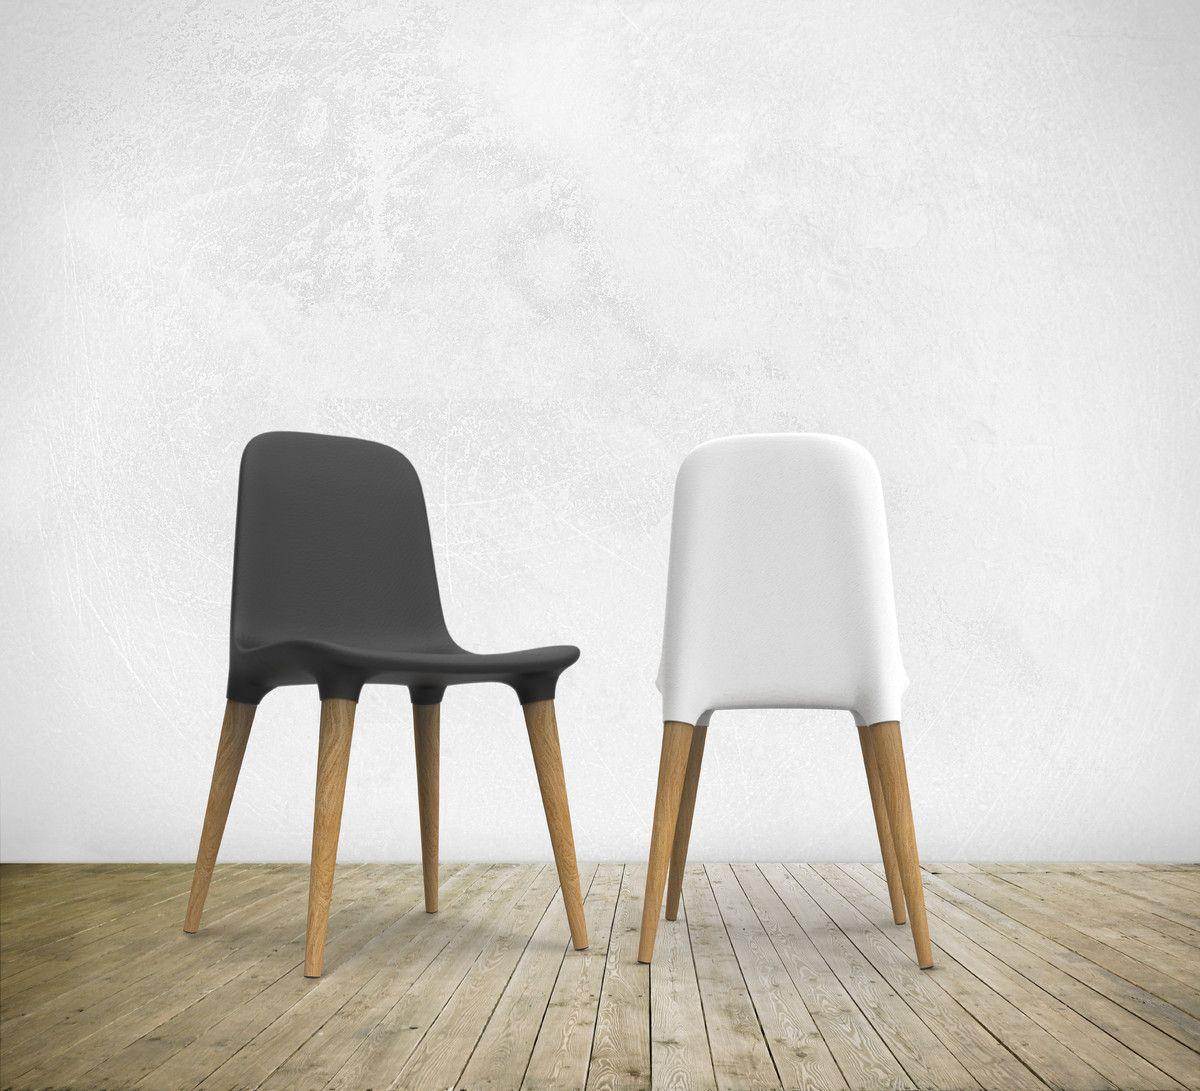 Comfort Creations Tonon Tako Chair Dining Chairs Elegant Dining Room Furniture